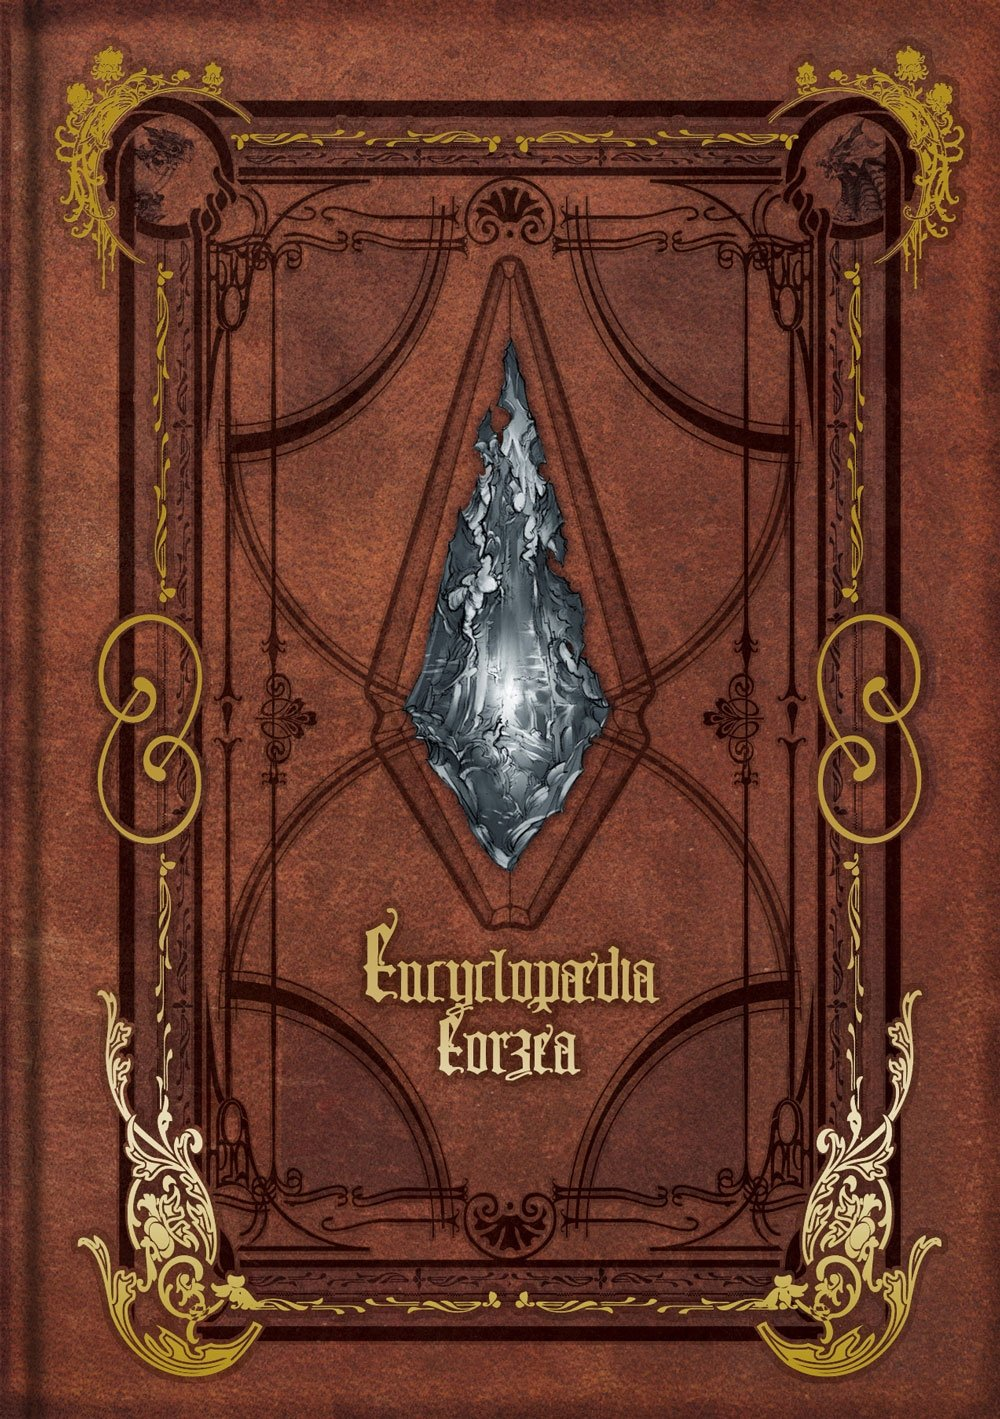 Encyclopaedia Eorzea - The World of FINAL FANTASY XIV - [Book